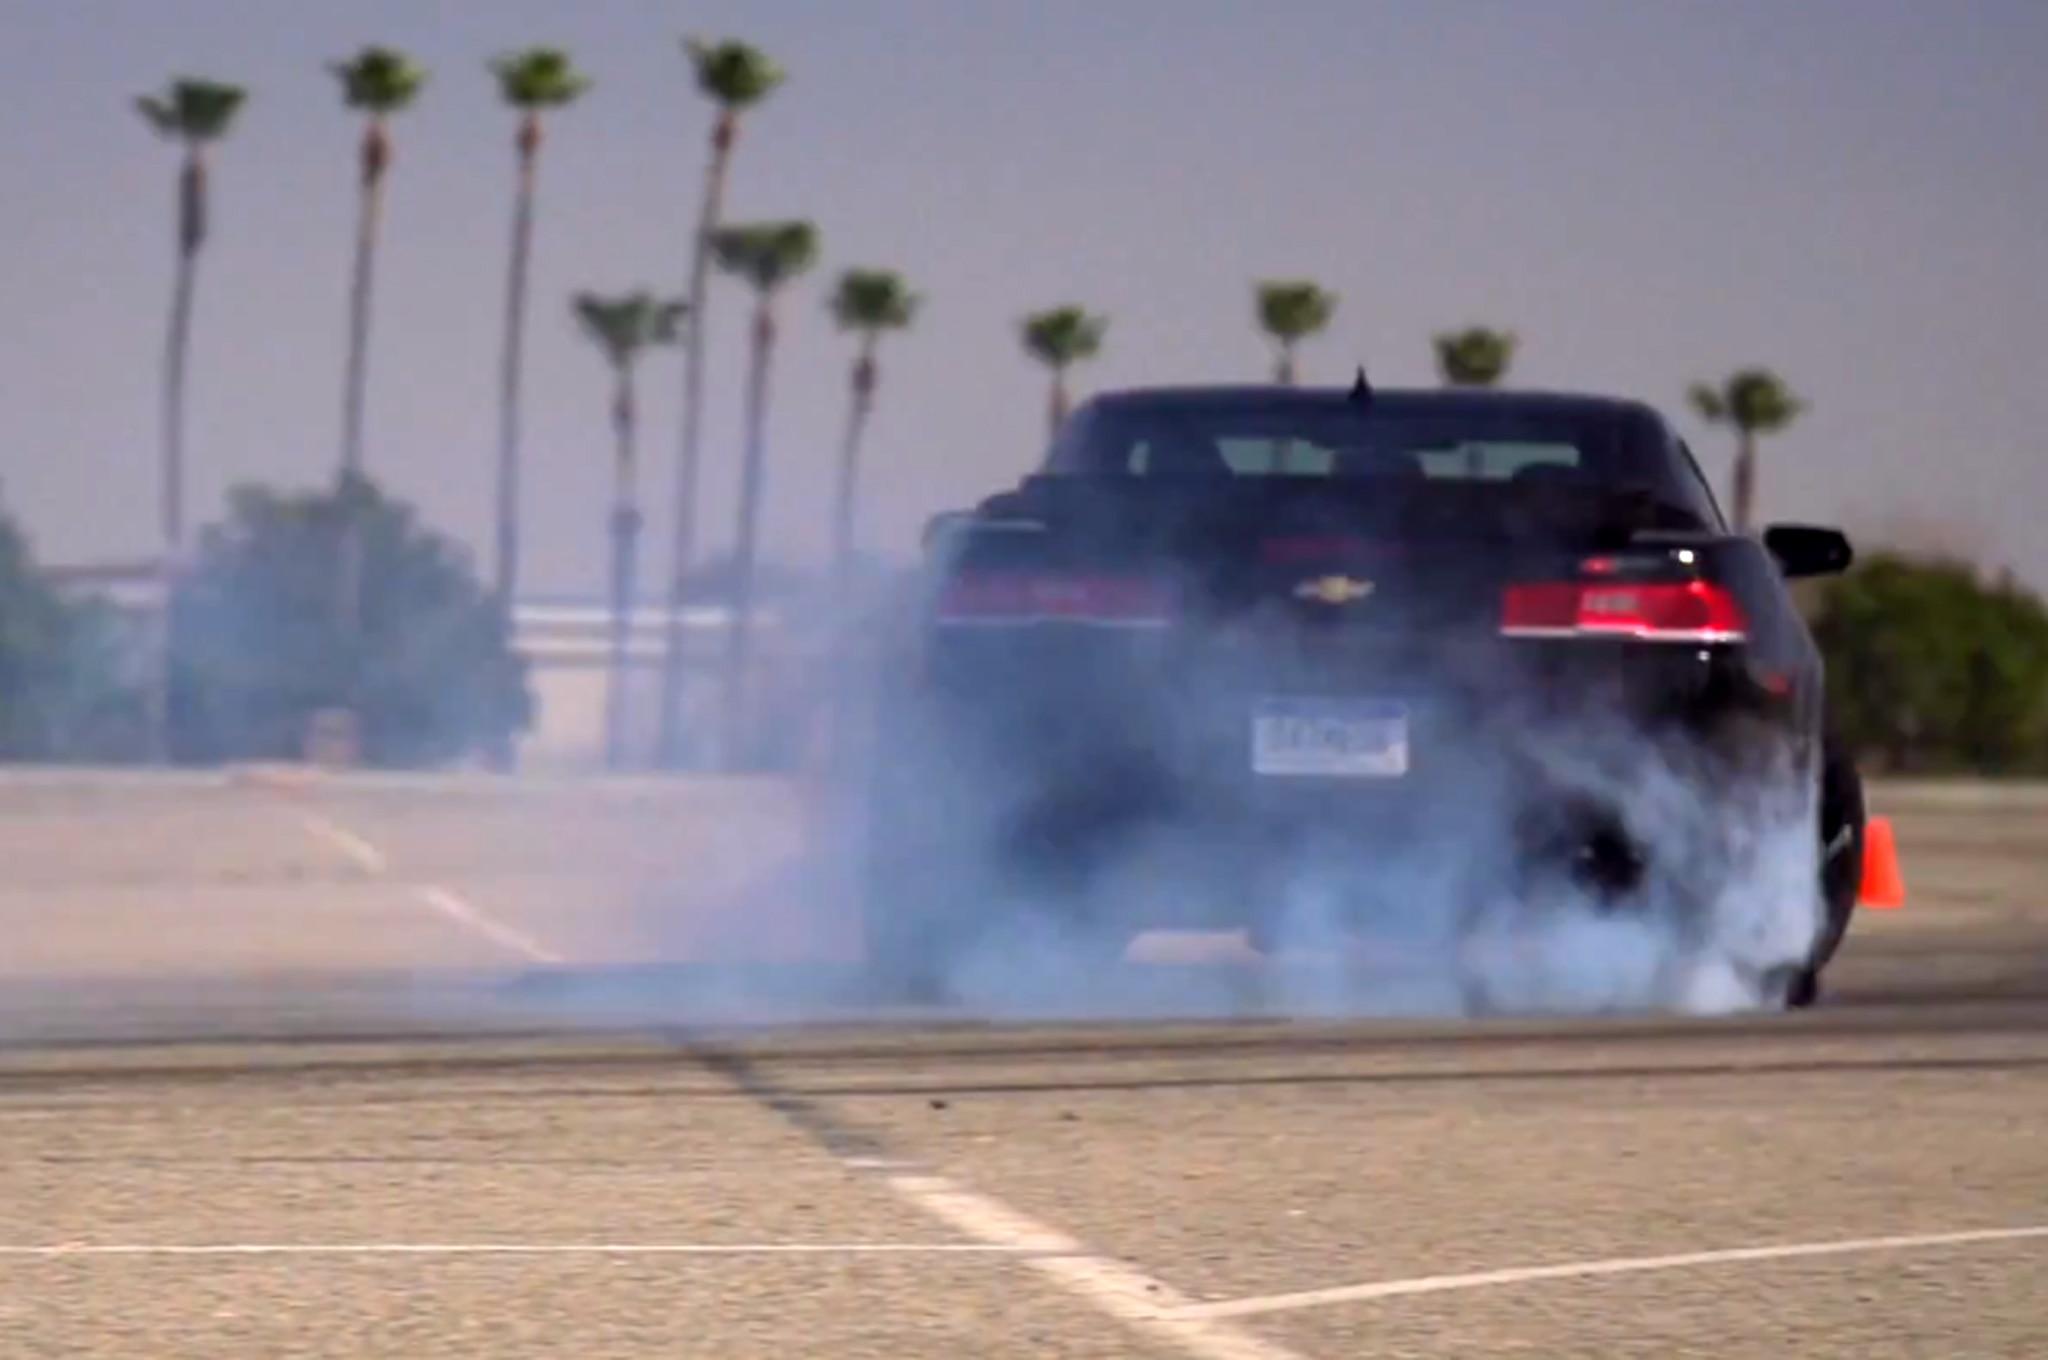 2014 Chevrolet Camaro Z28 Drifting Video